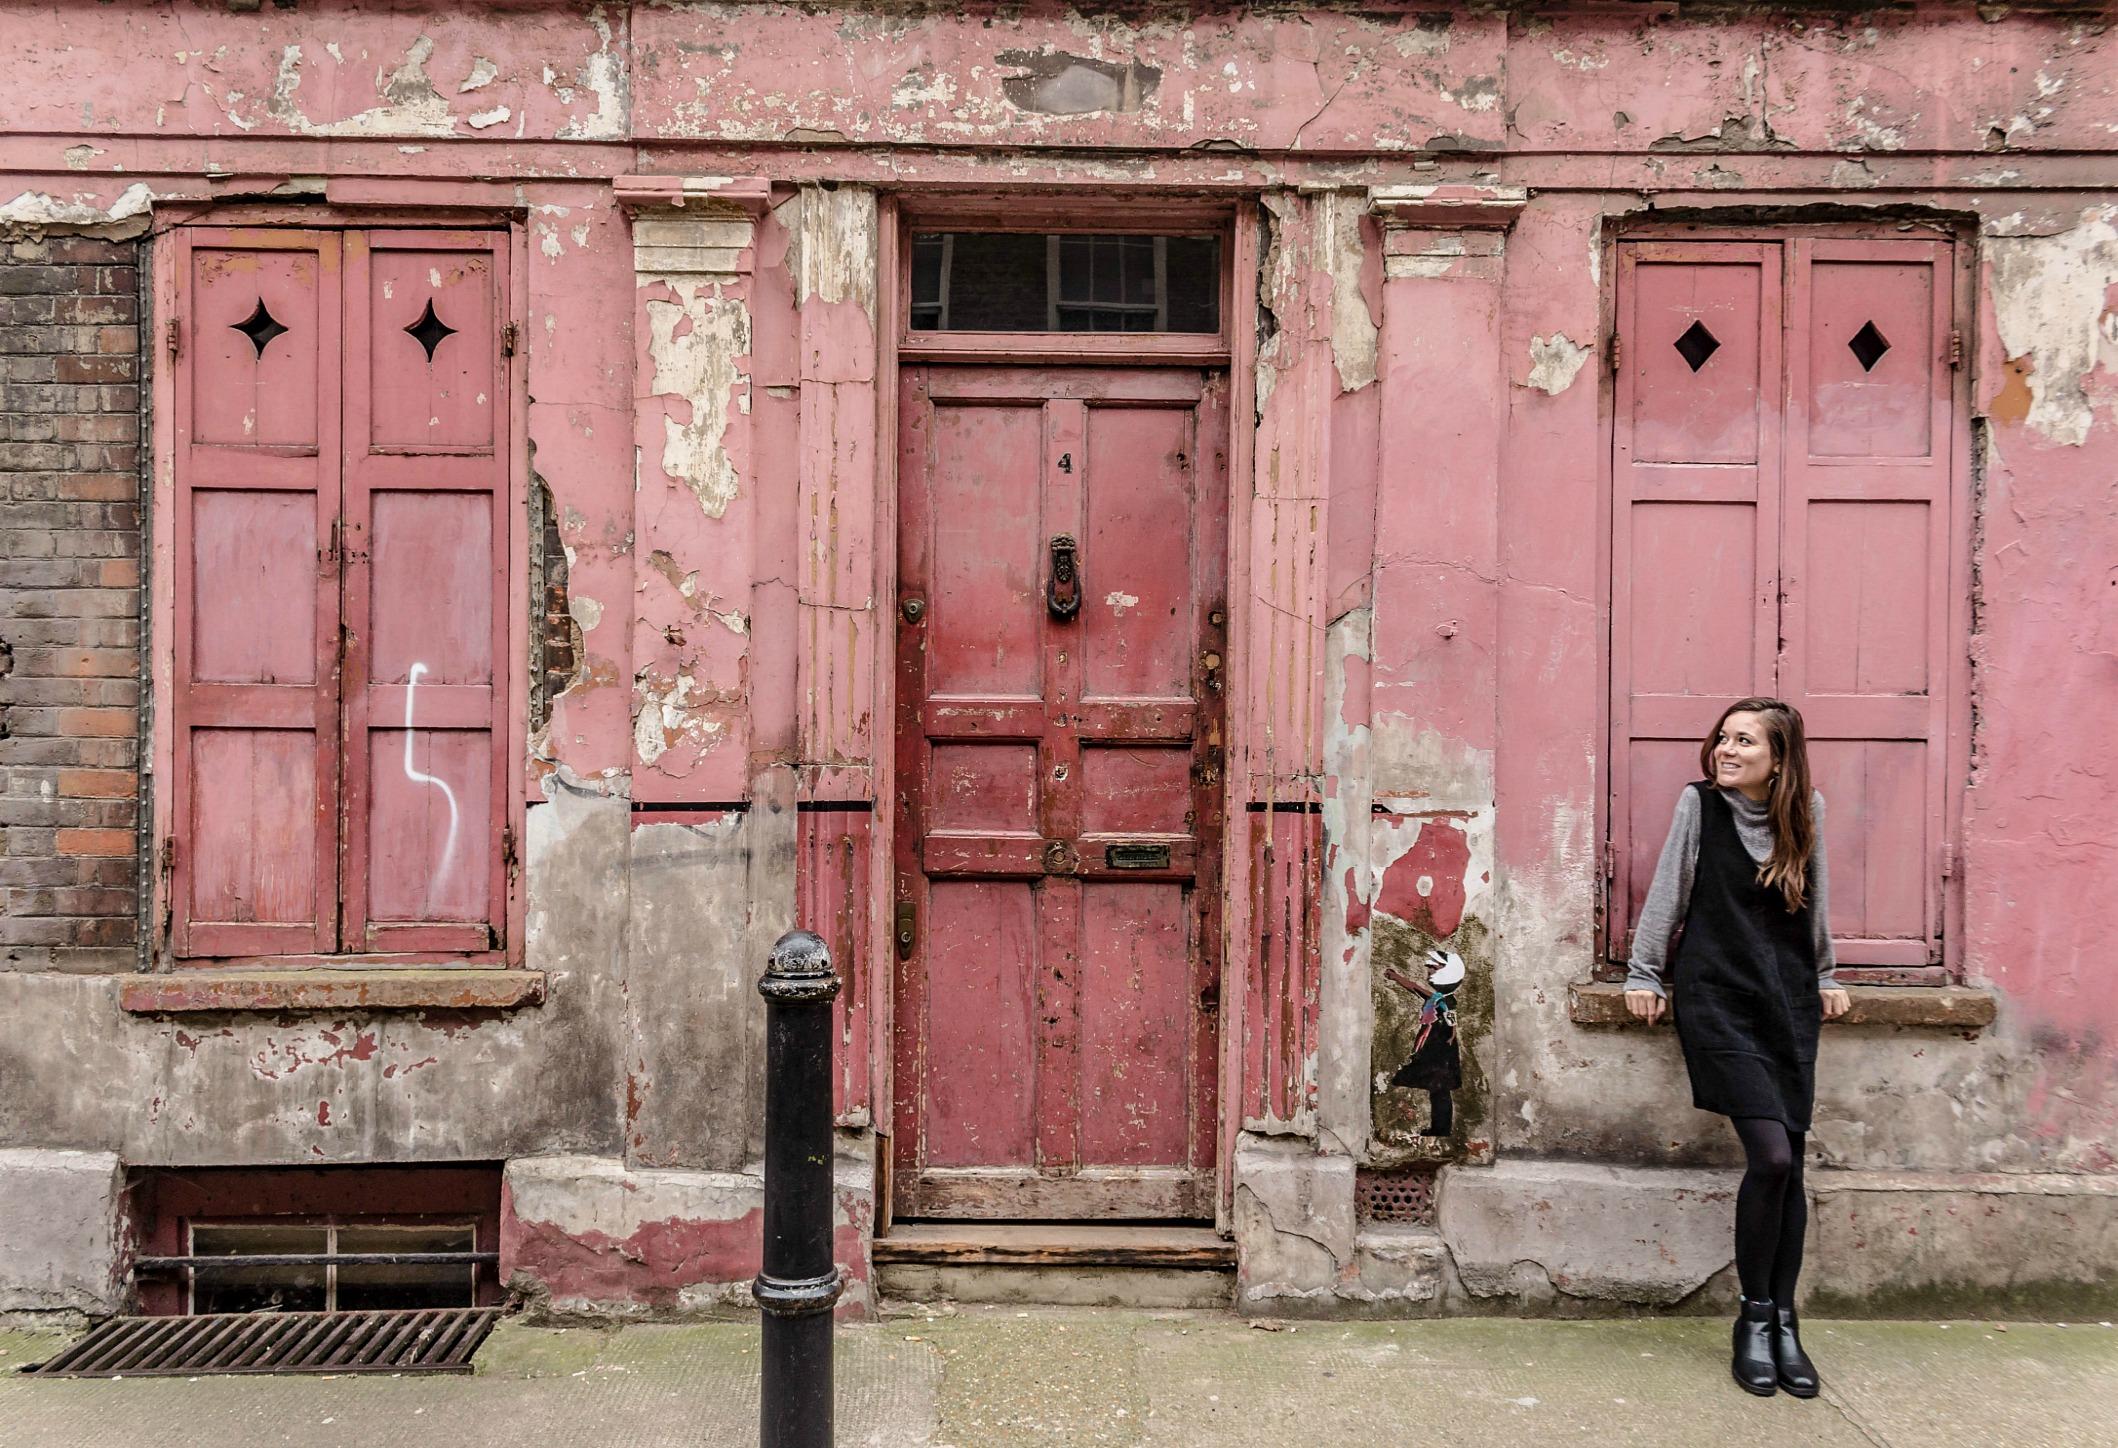 4 PRINCELET STREET, SPITALFIELDS— MY FAVOURITE DOOR IN ALL OF LONDON